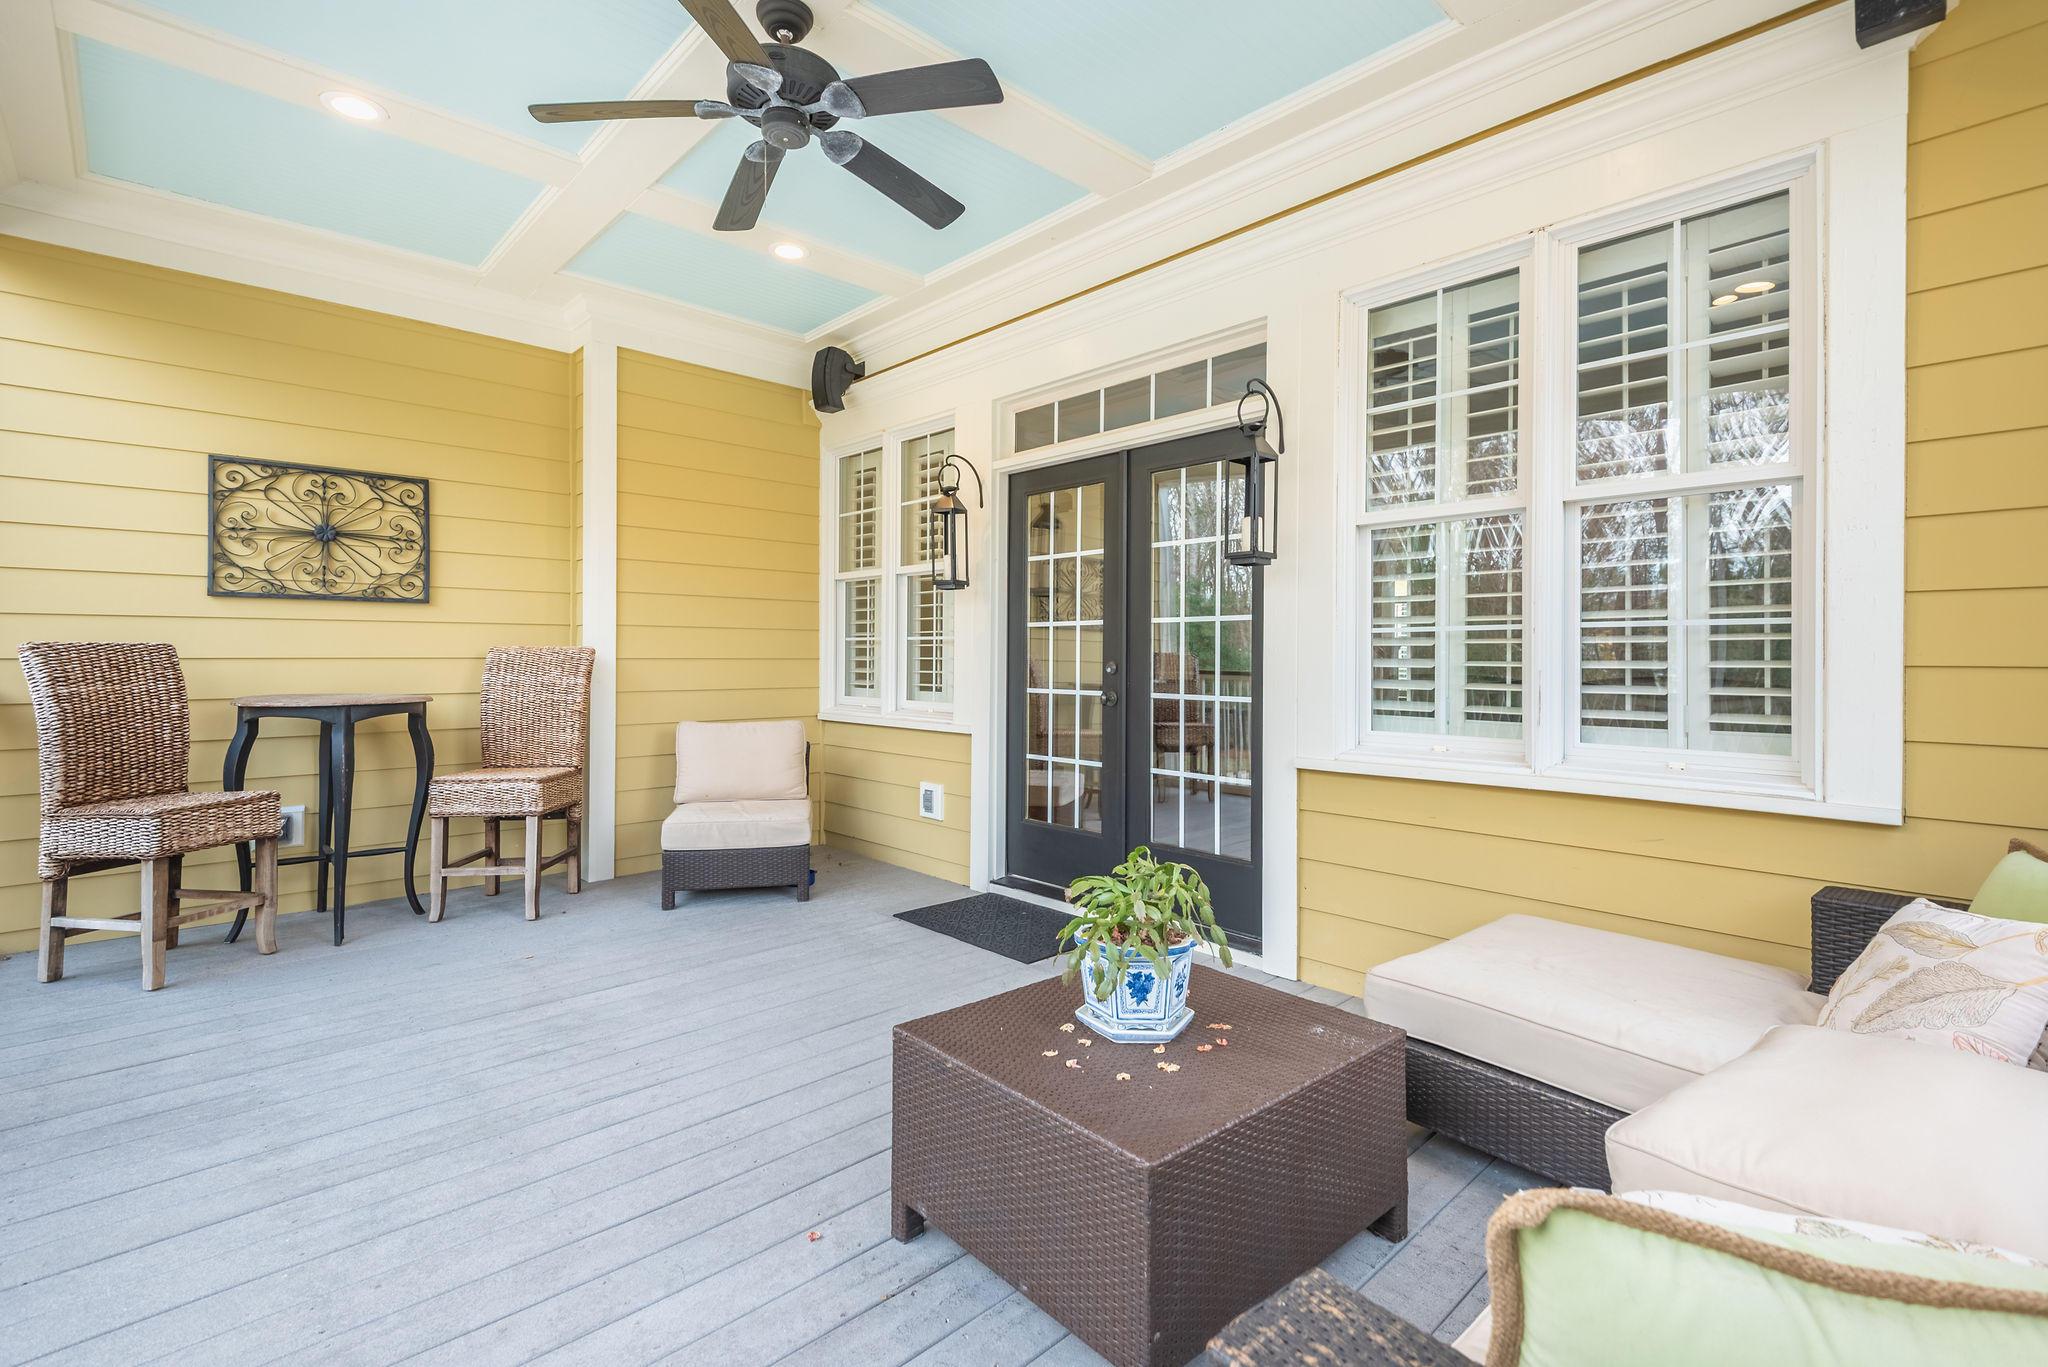 Dunes West Homes For Sale - 1305 King Bird, Mount Pleasant, SC - 13